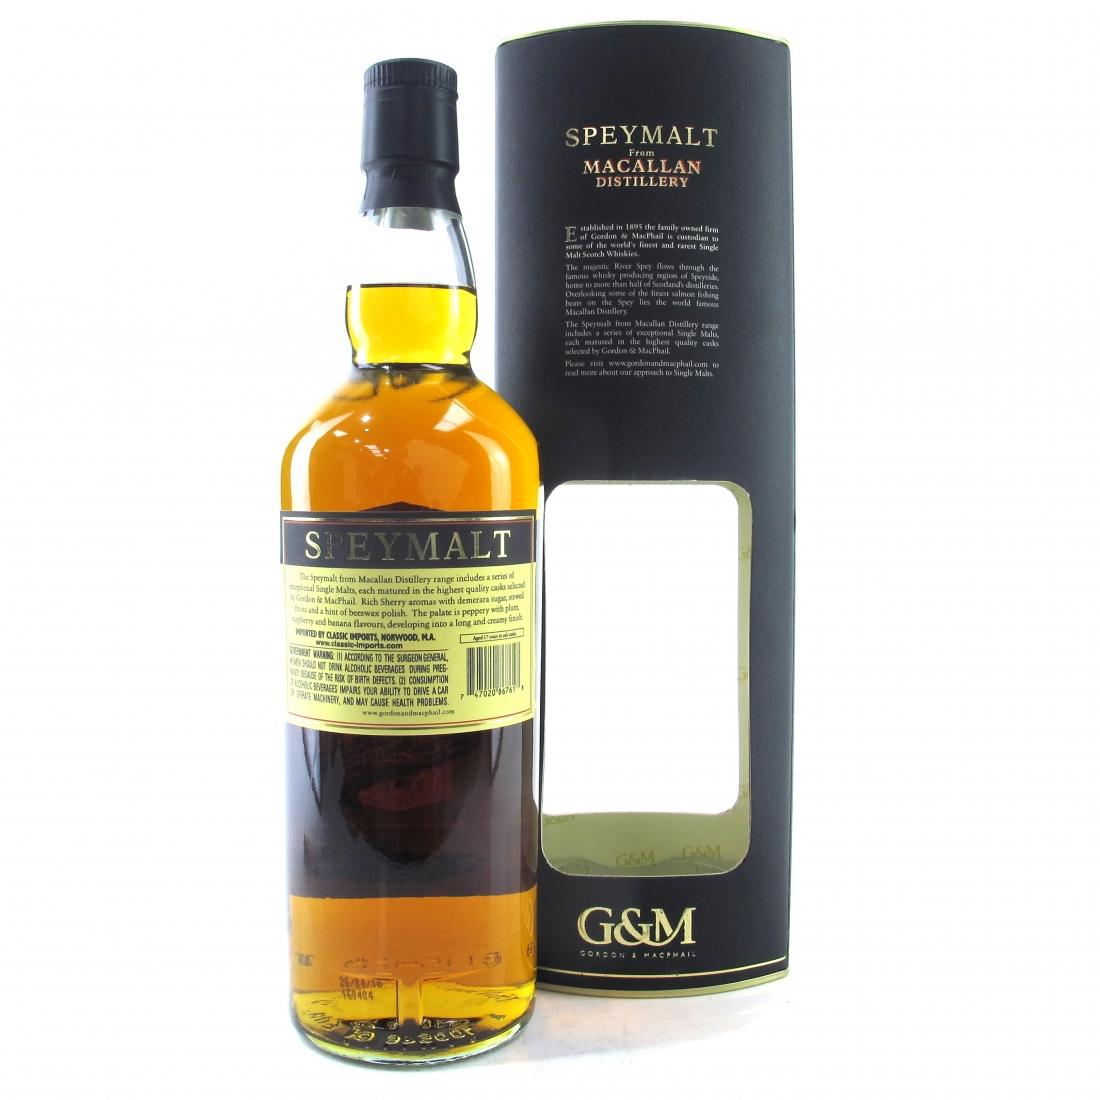 Macallan 1998 Speymalt Gordon and MacPhail 75cl / US Import